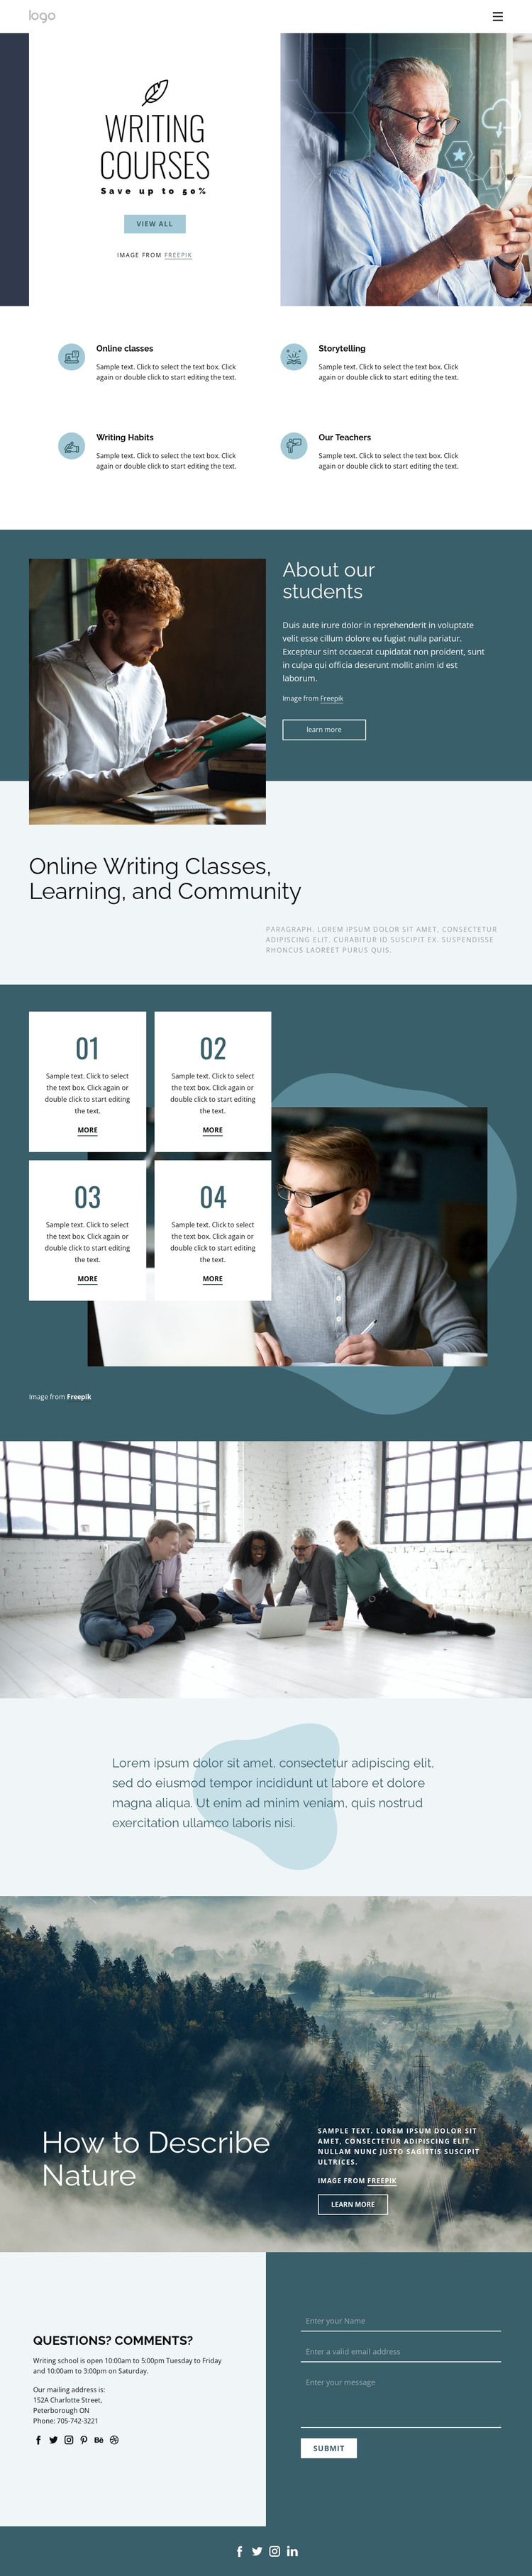 Creative writing courses Web Design